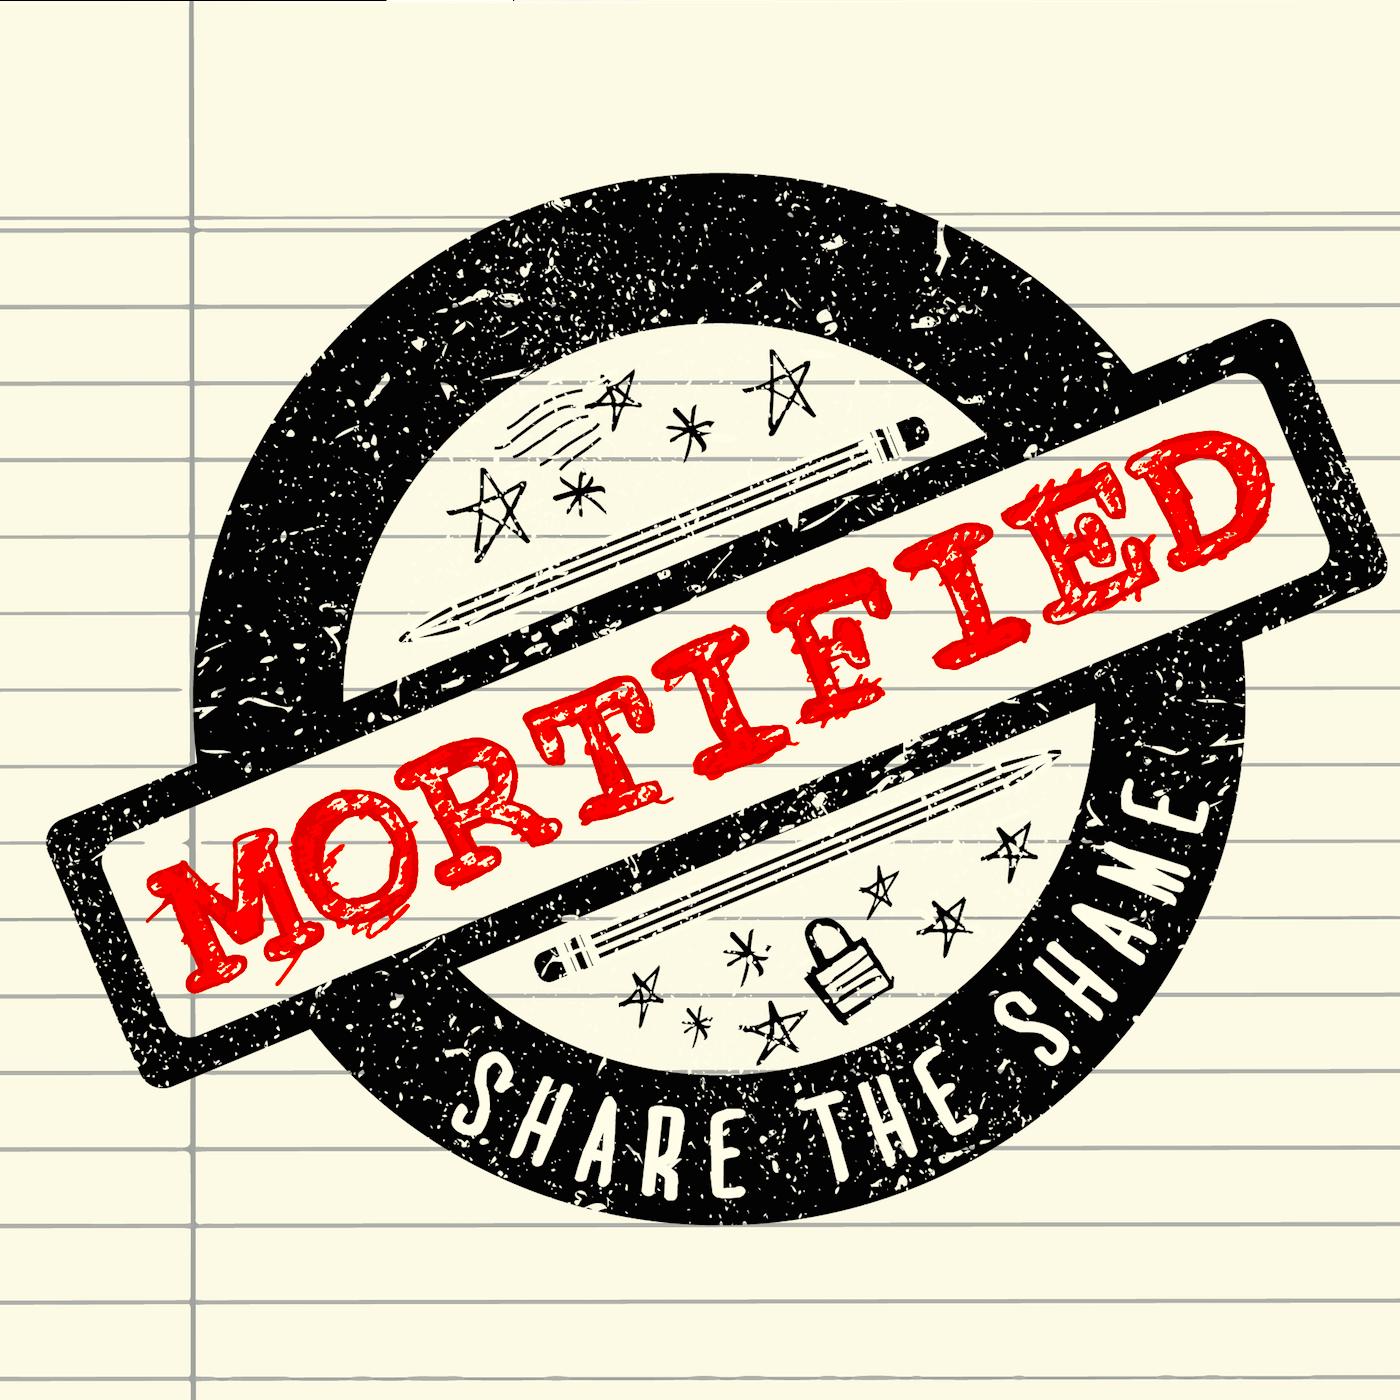 Mortified_alt_logo_1400x1400_small